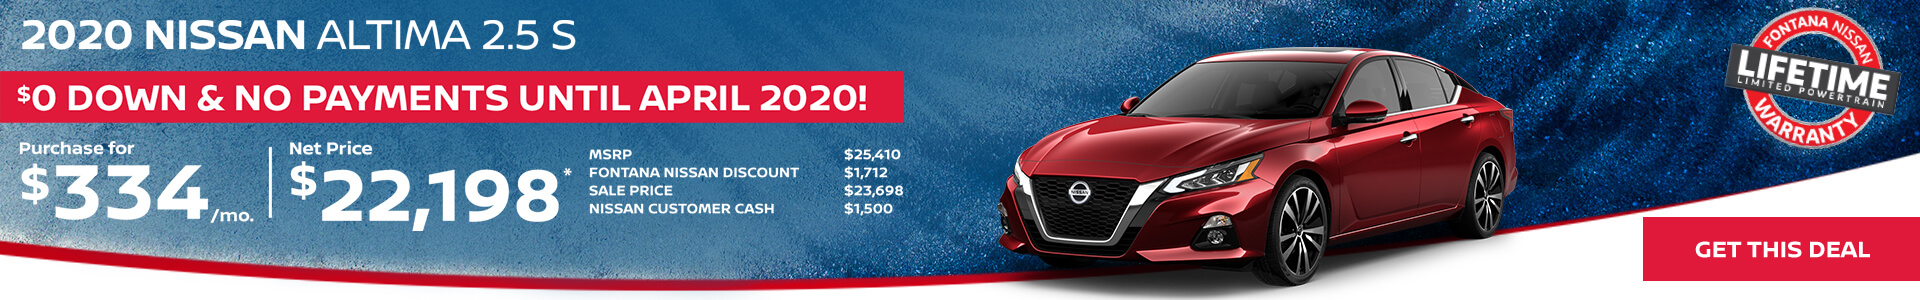 Nissan Altima $334